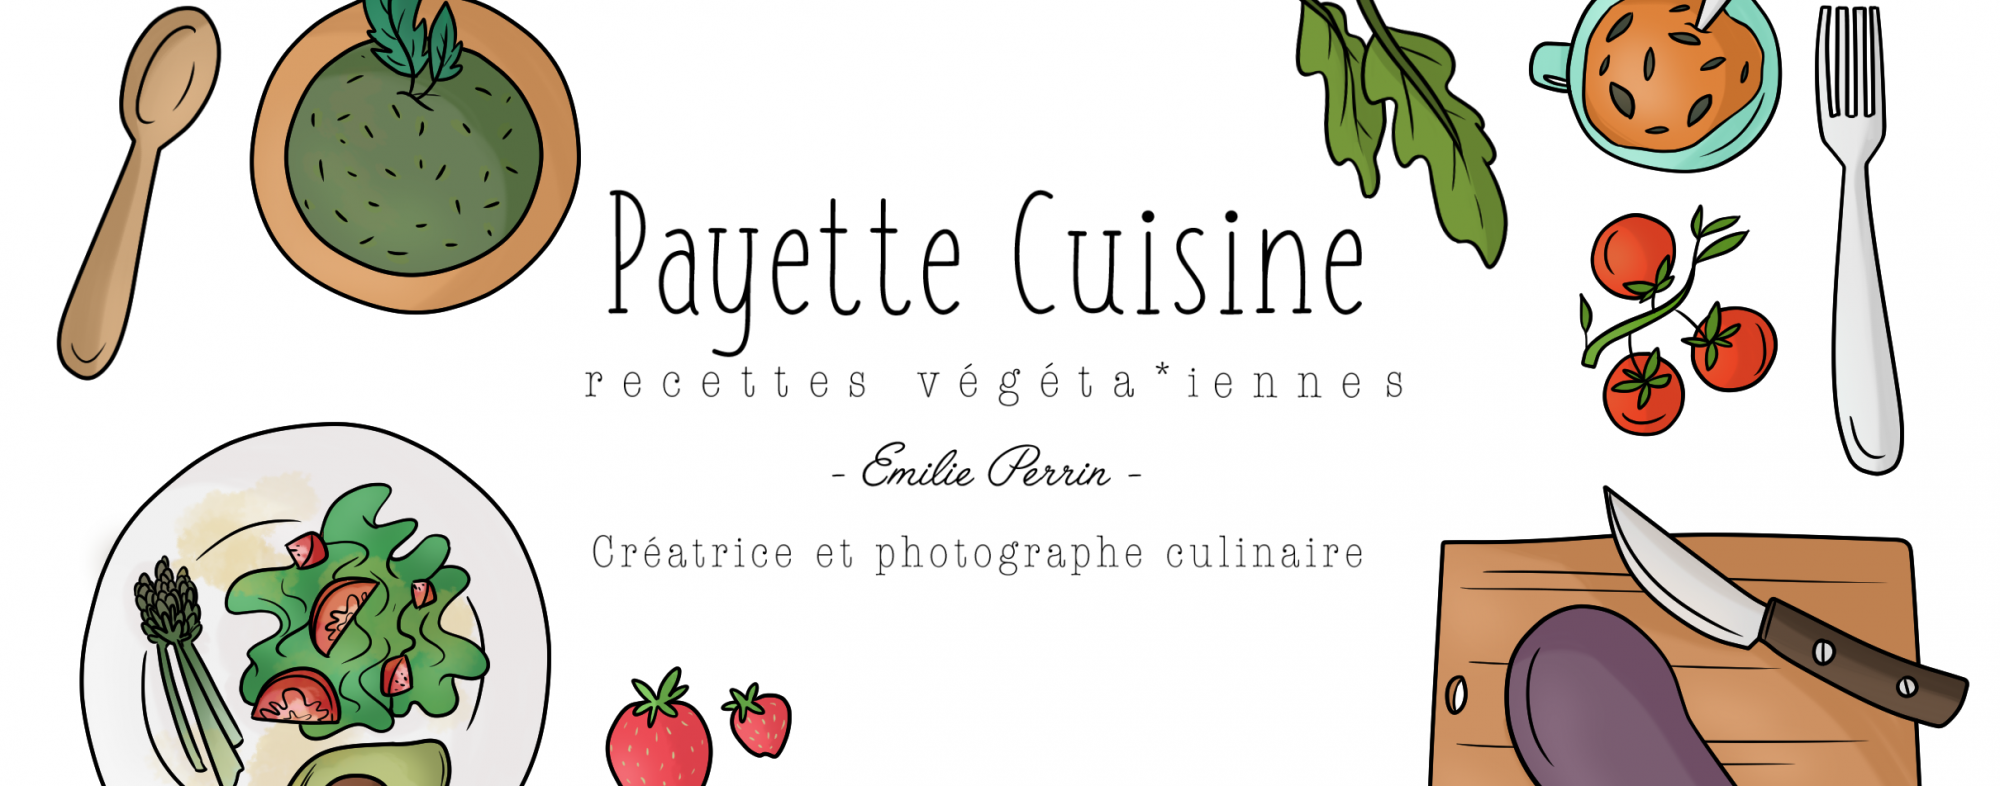 Payette cuisine